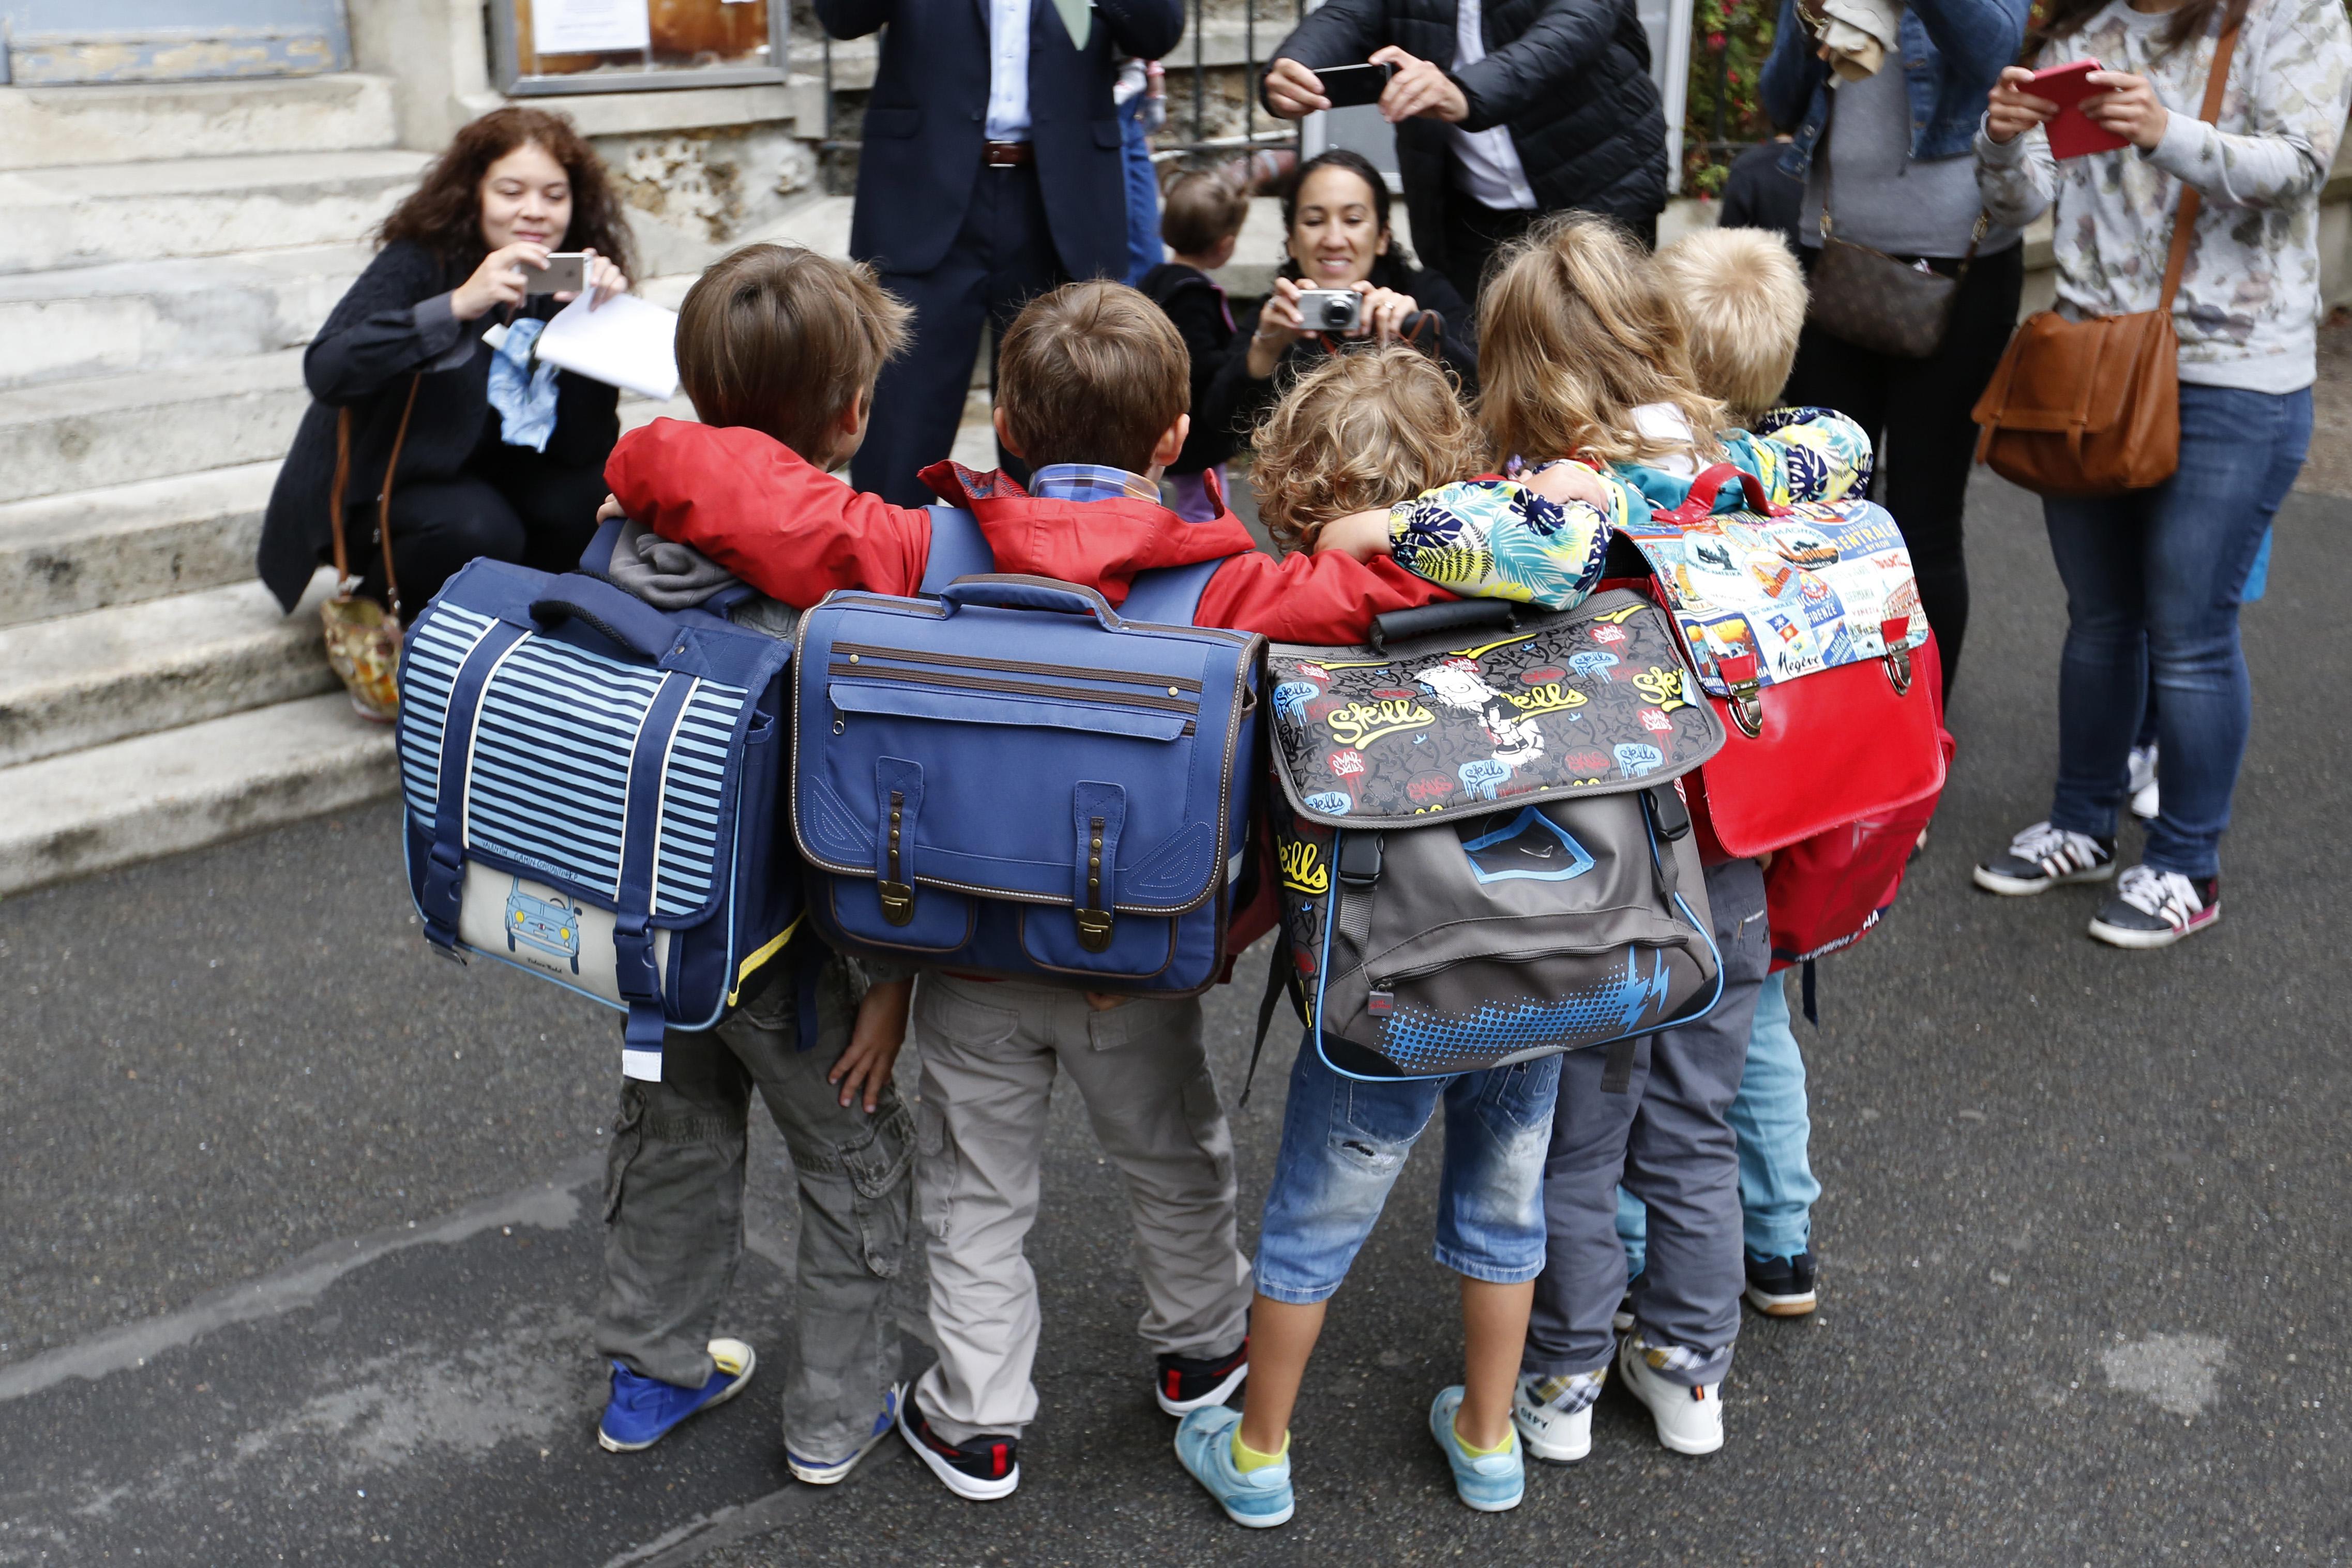 Schoolchildren pose for a group photo